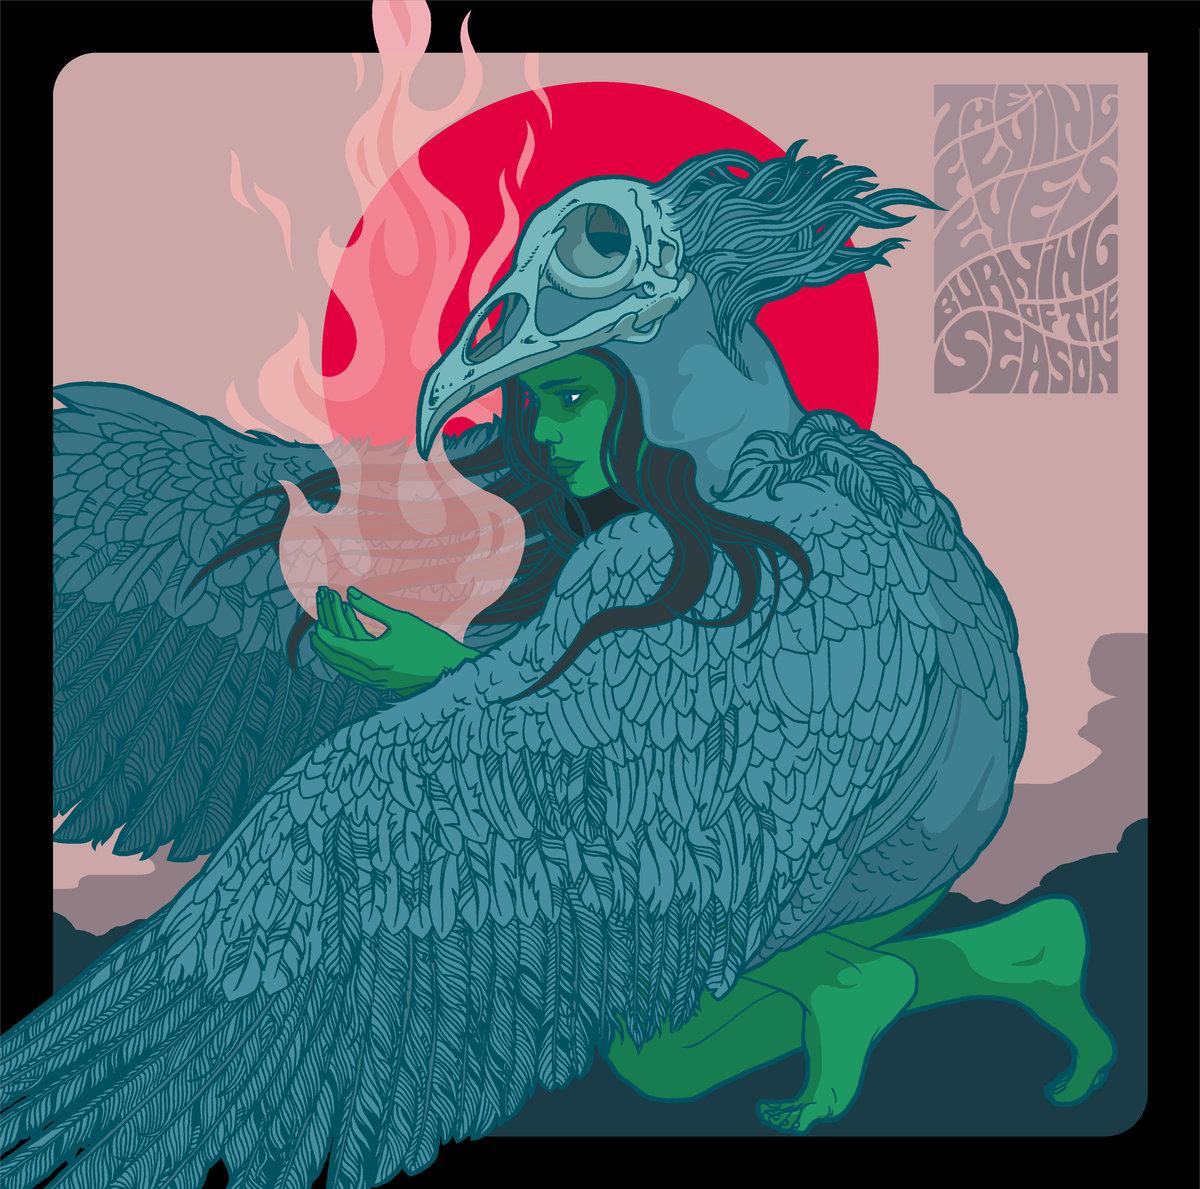 Burning of the Season_Album Cover